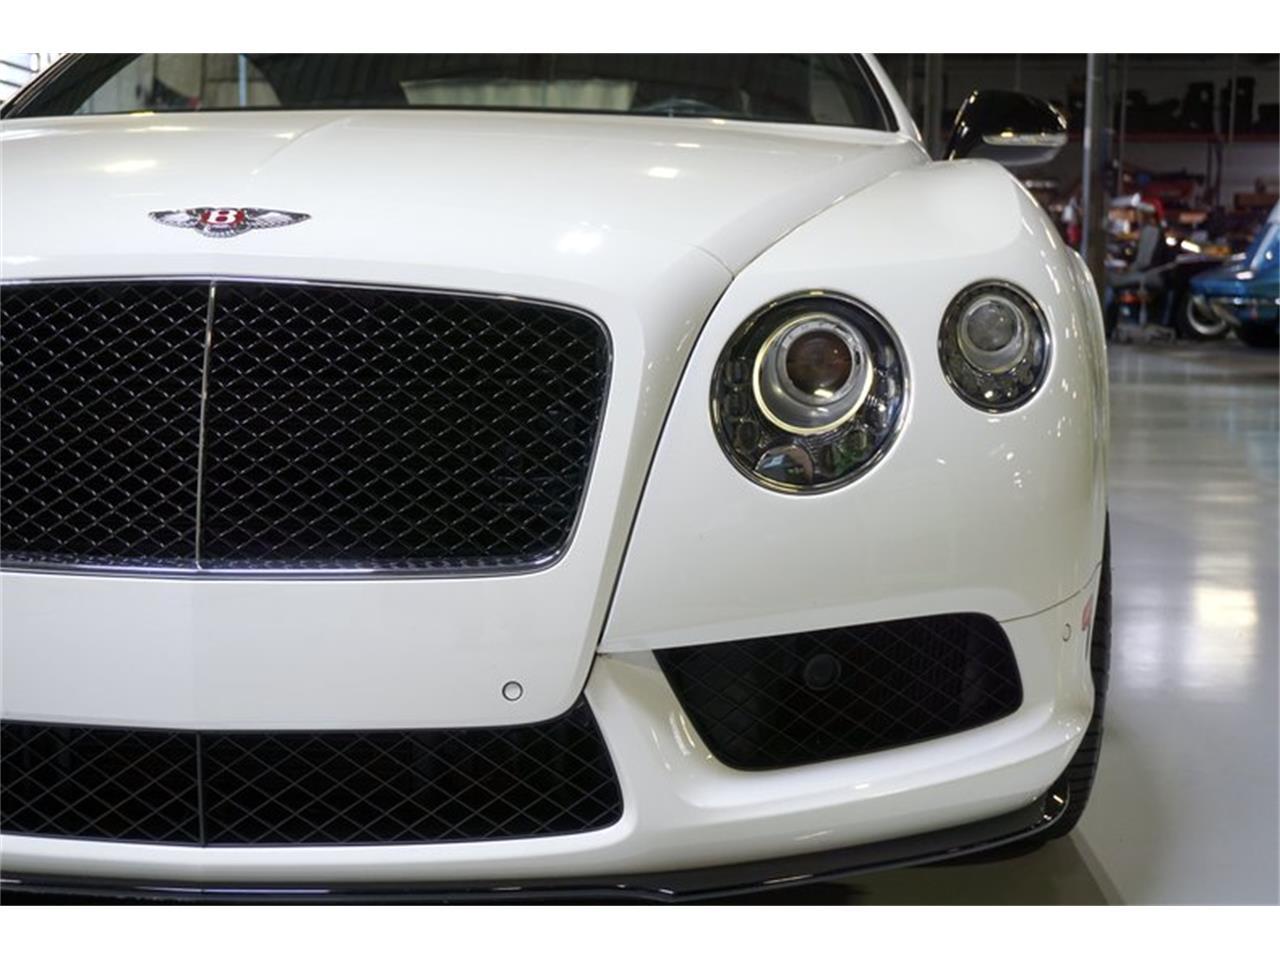 2015 Bentley Continental (CC-1251575) for sale in Solon, Ohio